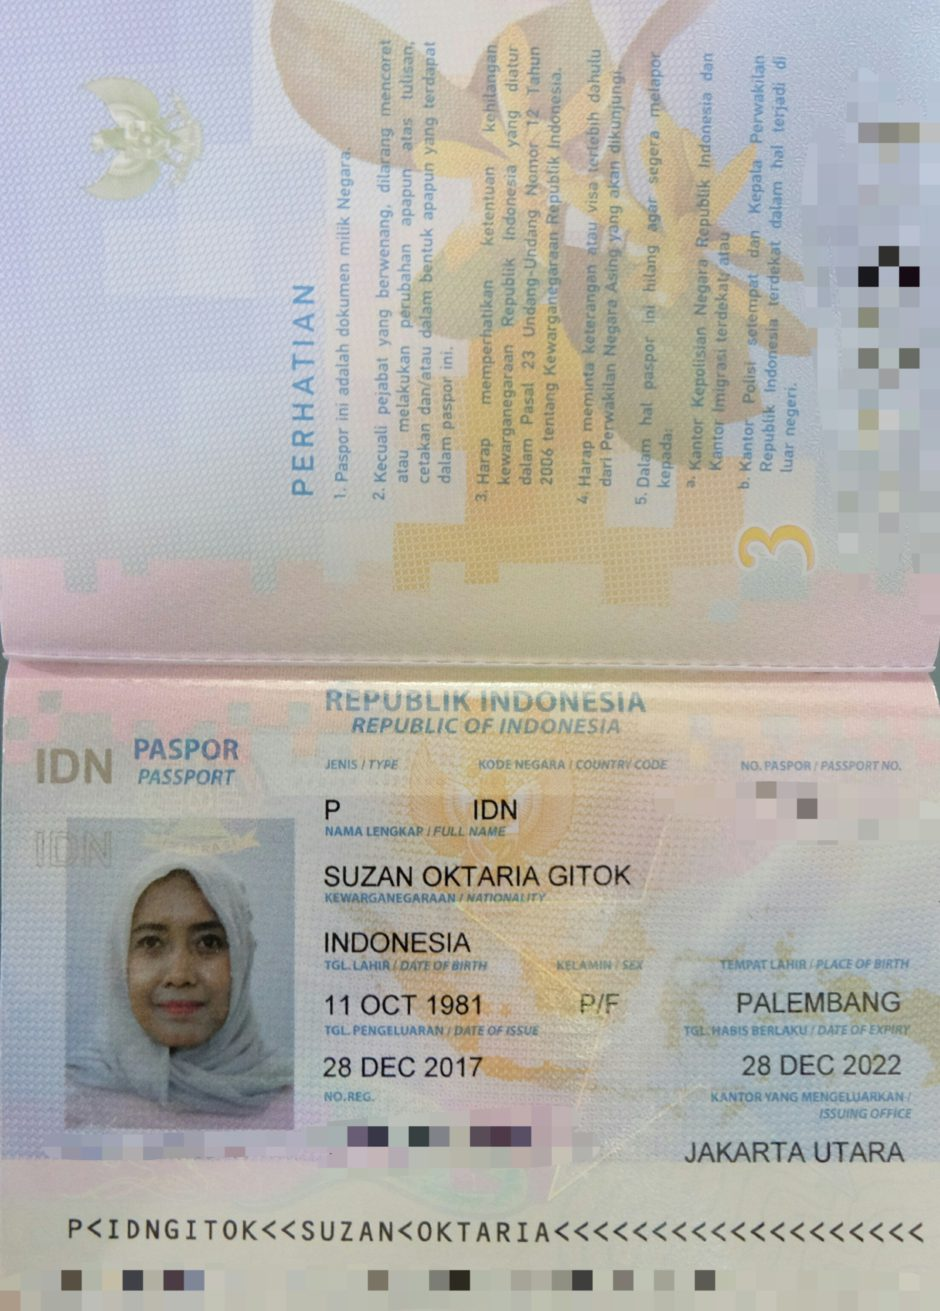 Penting Segera Perbaiki Salah Nama di Passport, Penting, Segera Perbaiki Salah Nama di Passport, Jurnal Suzannita